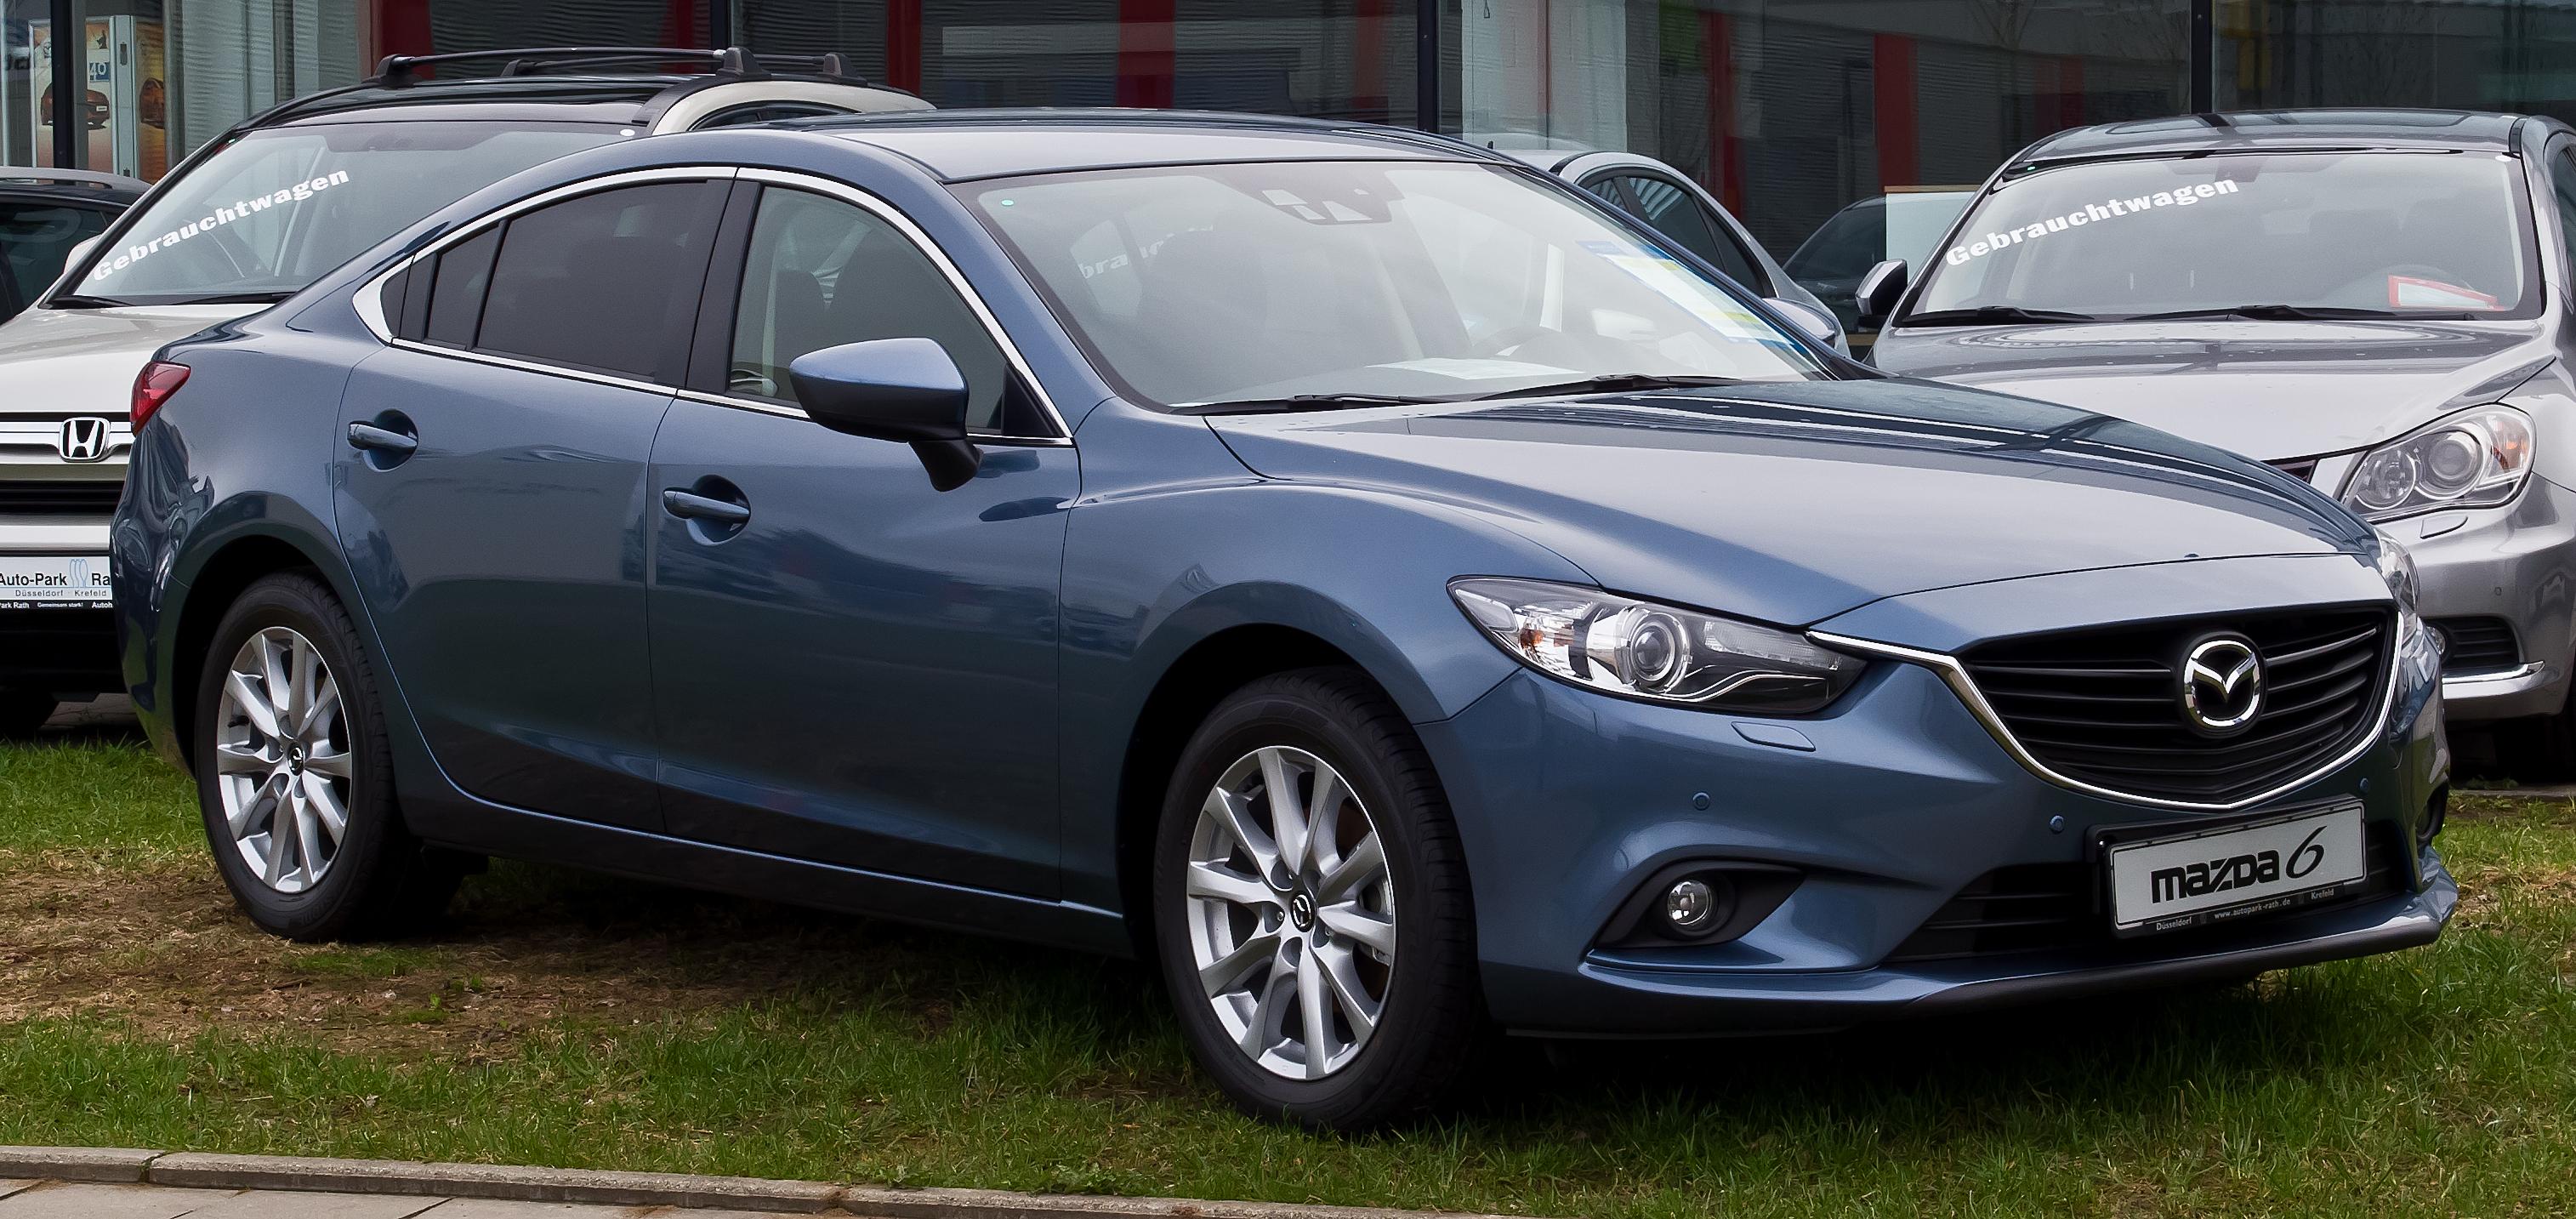 File:Mazda6 2.0 SKYACTIV-G Center-Line (GJ) – Frontansicht, 14 ...